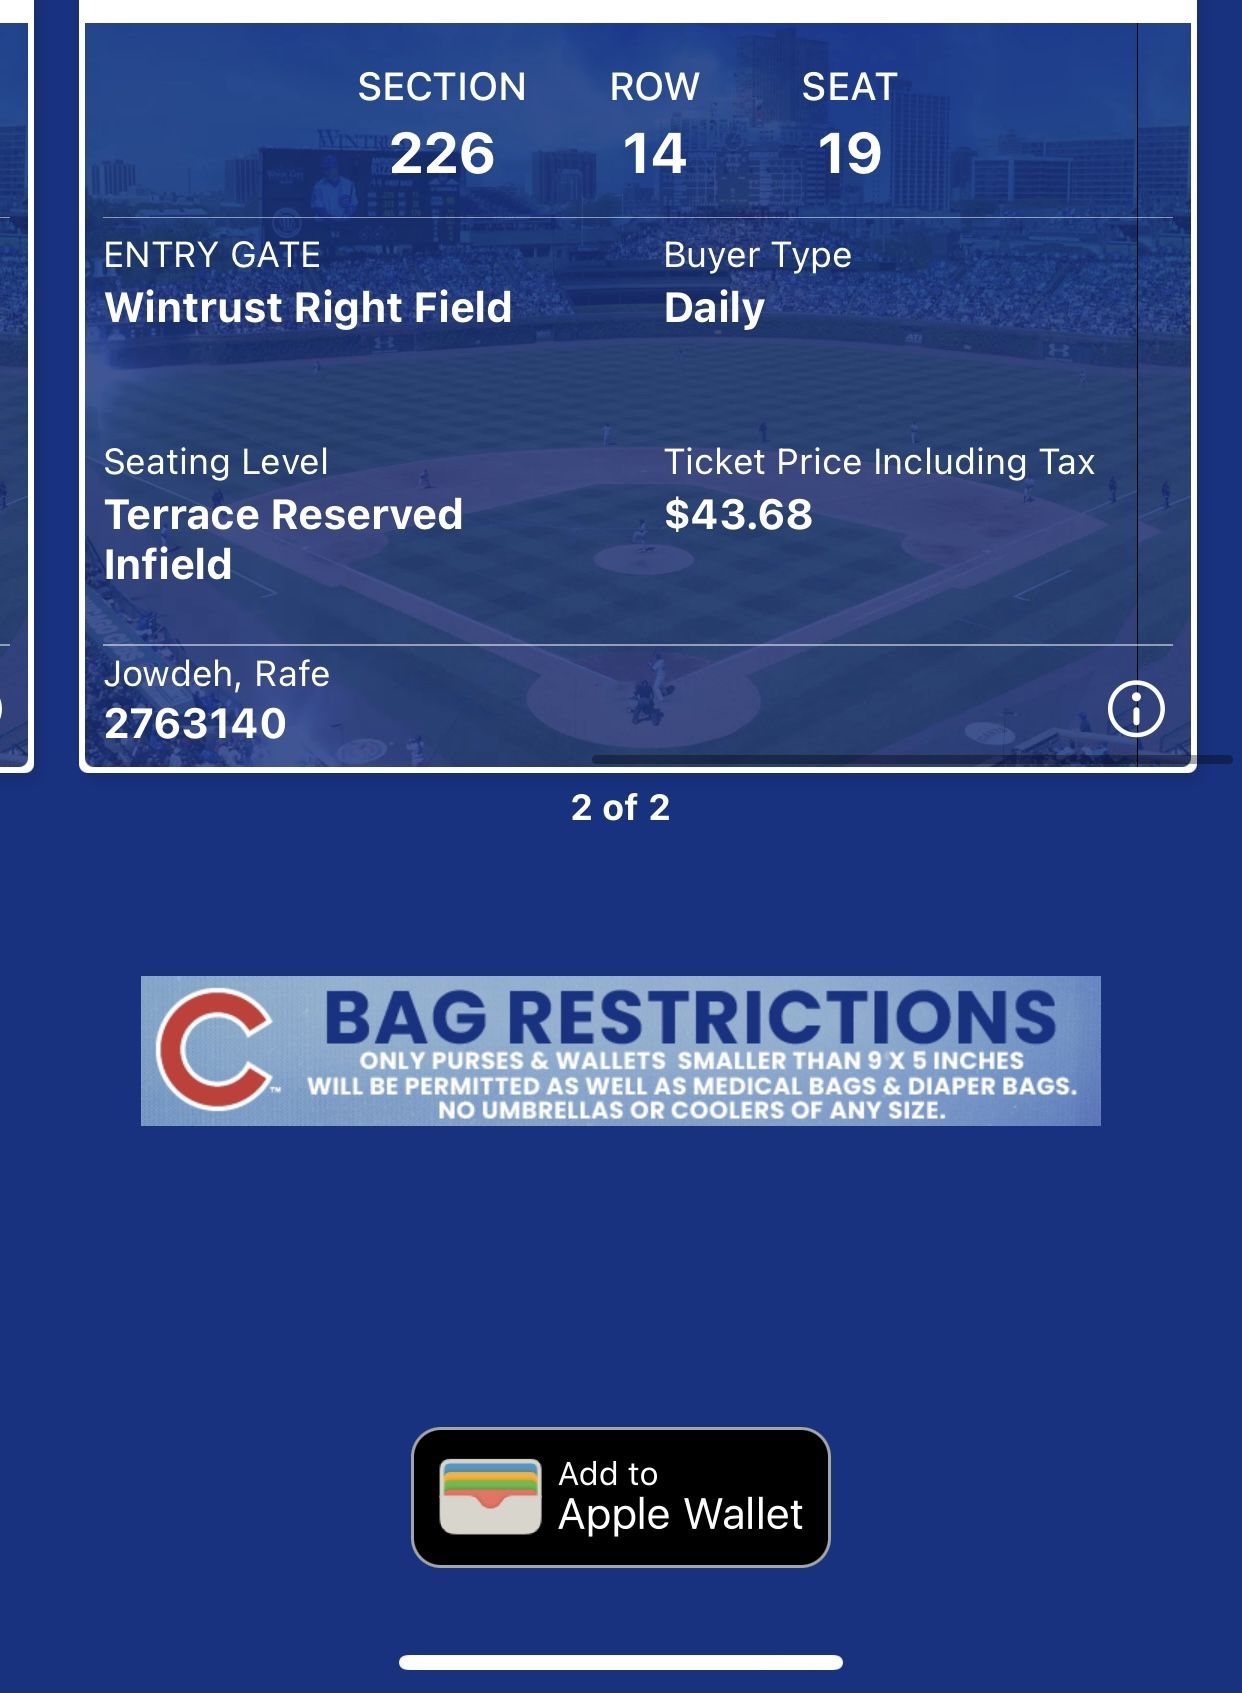 Cardinals Vs Cubs Tickets (cash App Only)